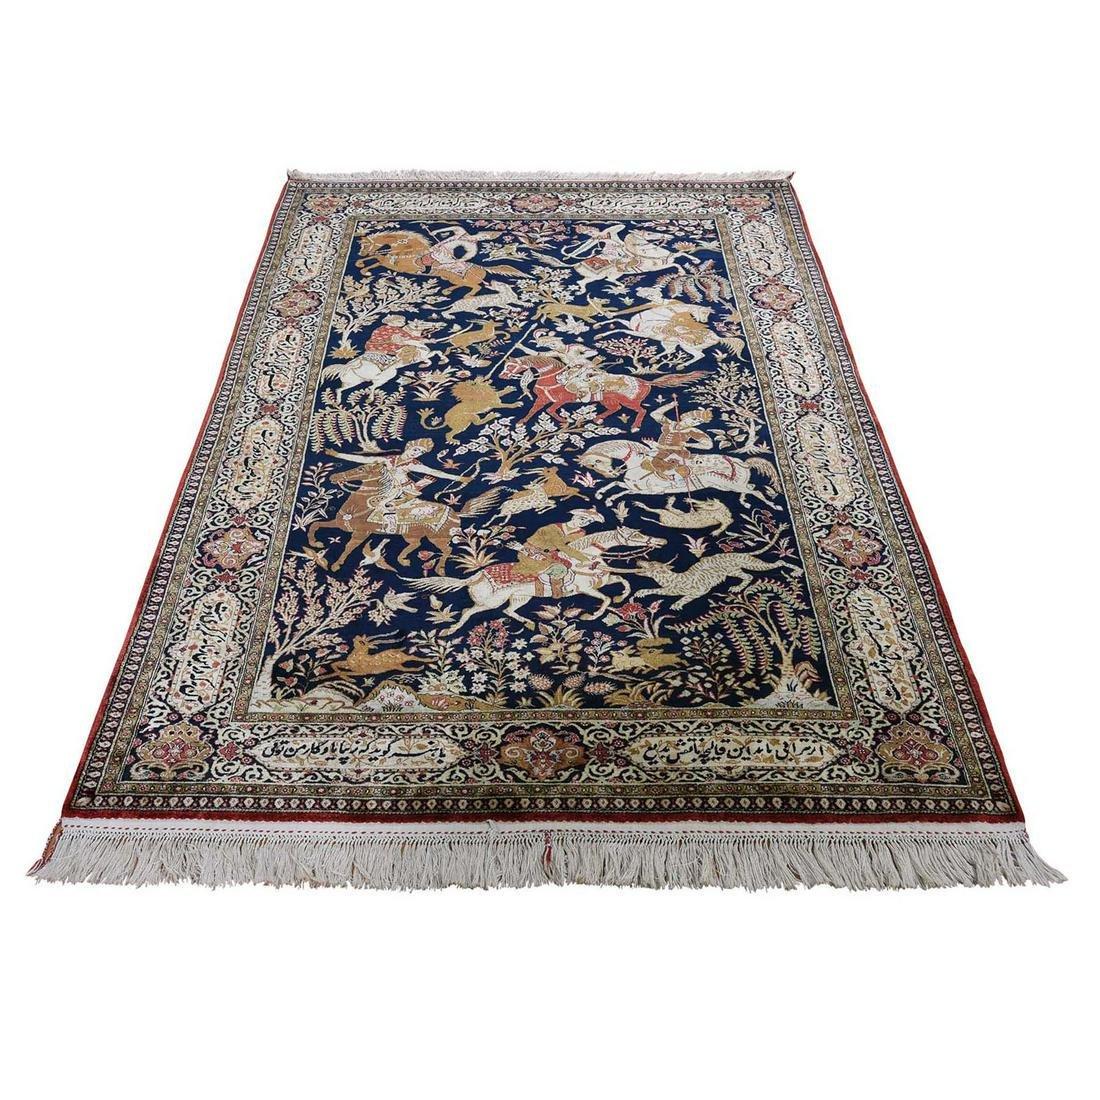 Navy Blue Vintage Persian Silk Qum Hunting Design With